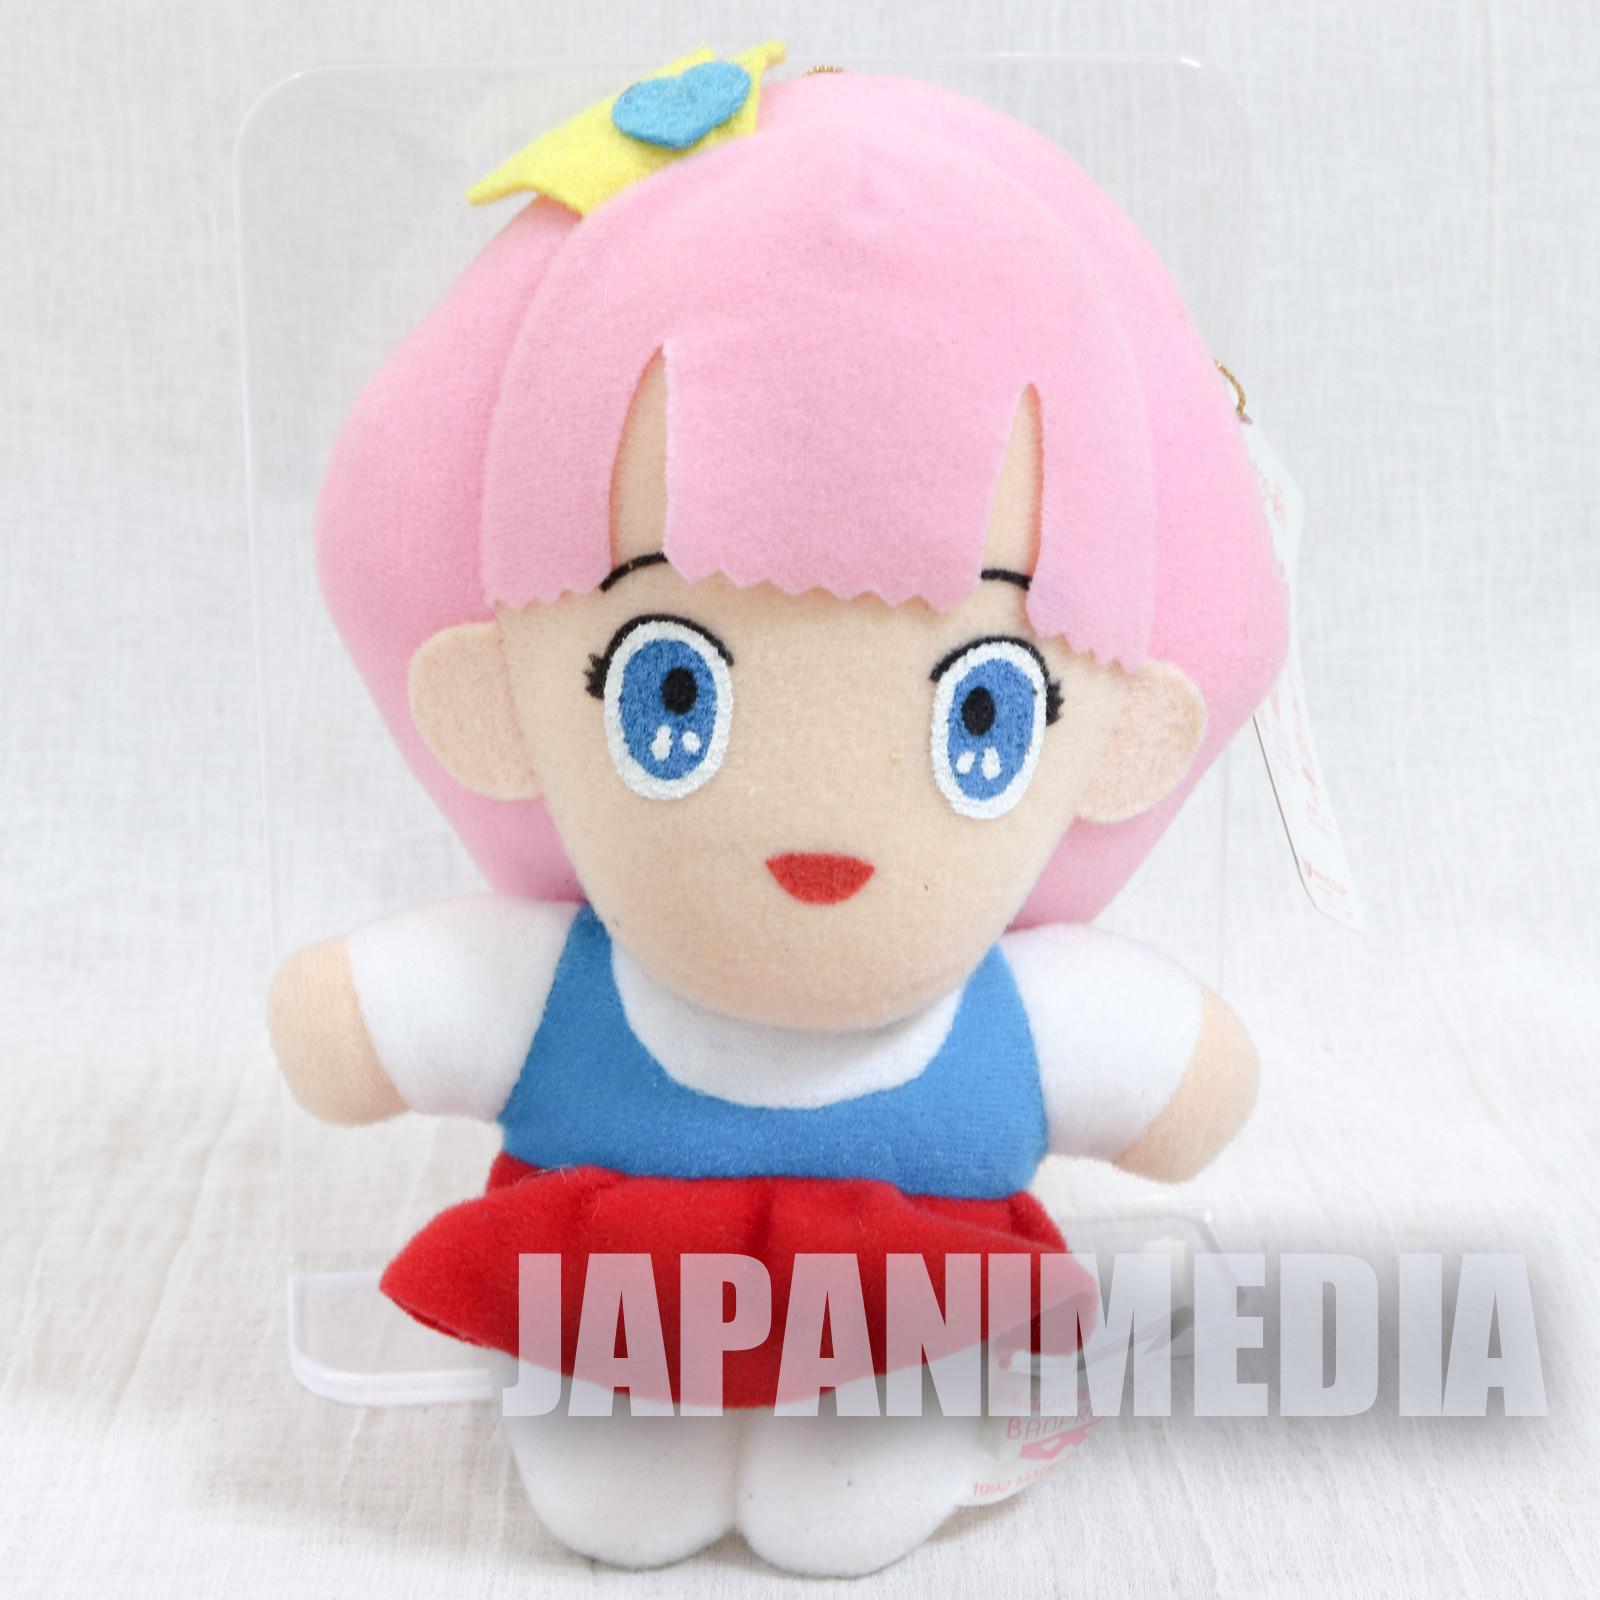 Magical Princess Minky Momo Plush Doll Banpresto JAPAN ANIME